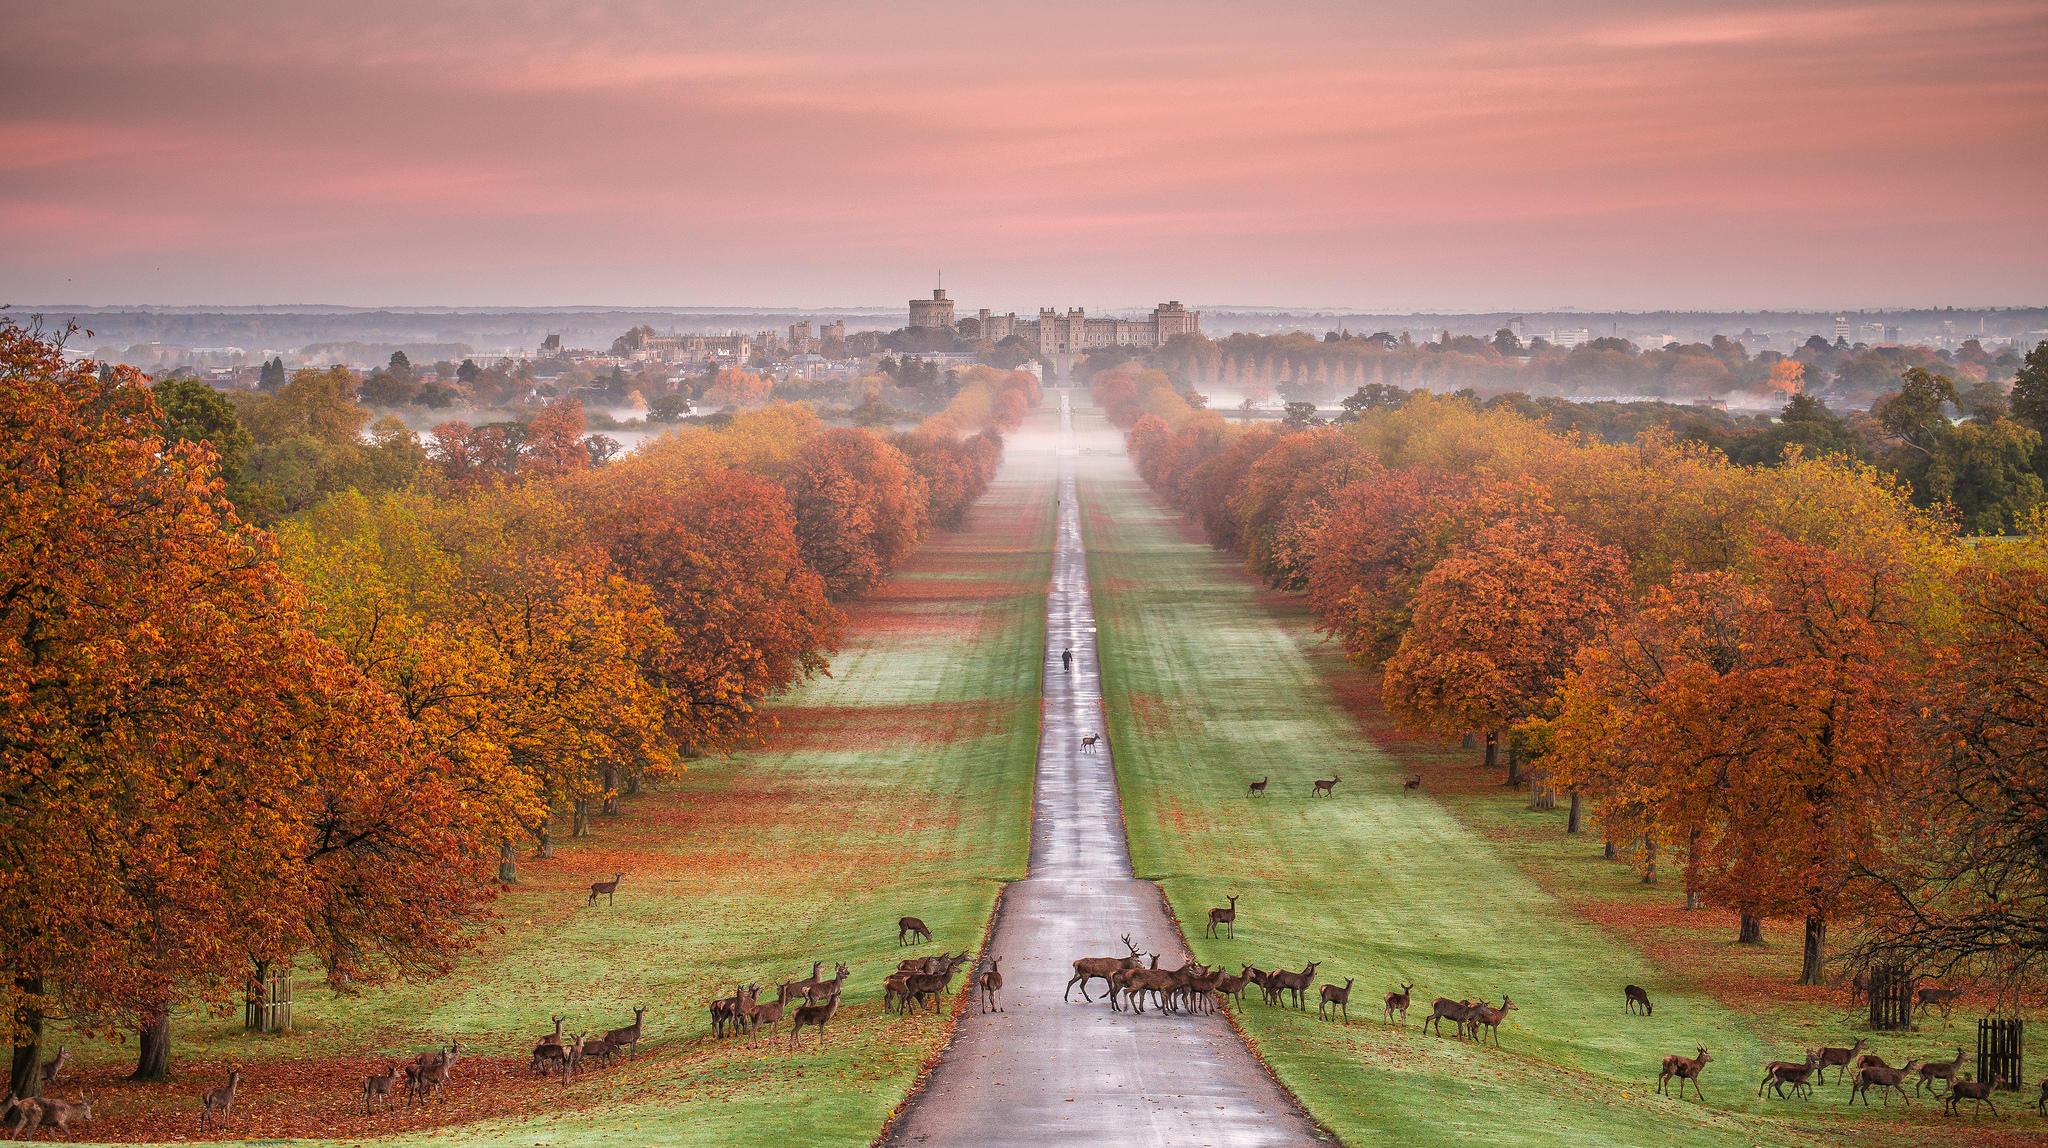 Обои Виндзорский замок, Windsor Castle, Виндзор, графство Беркшир